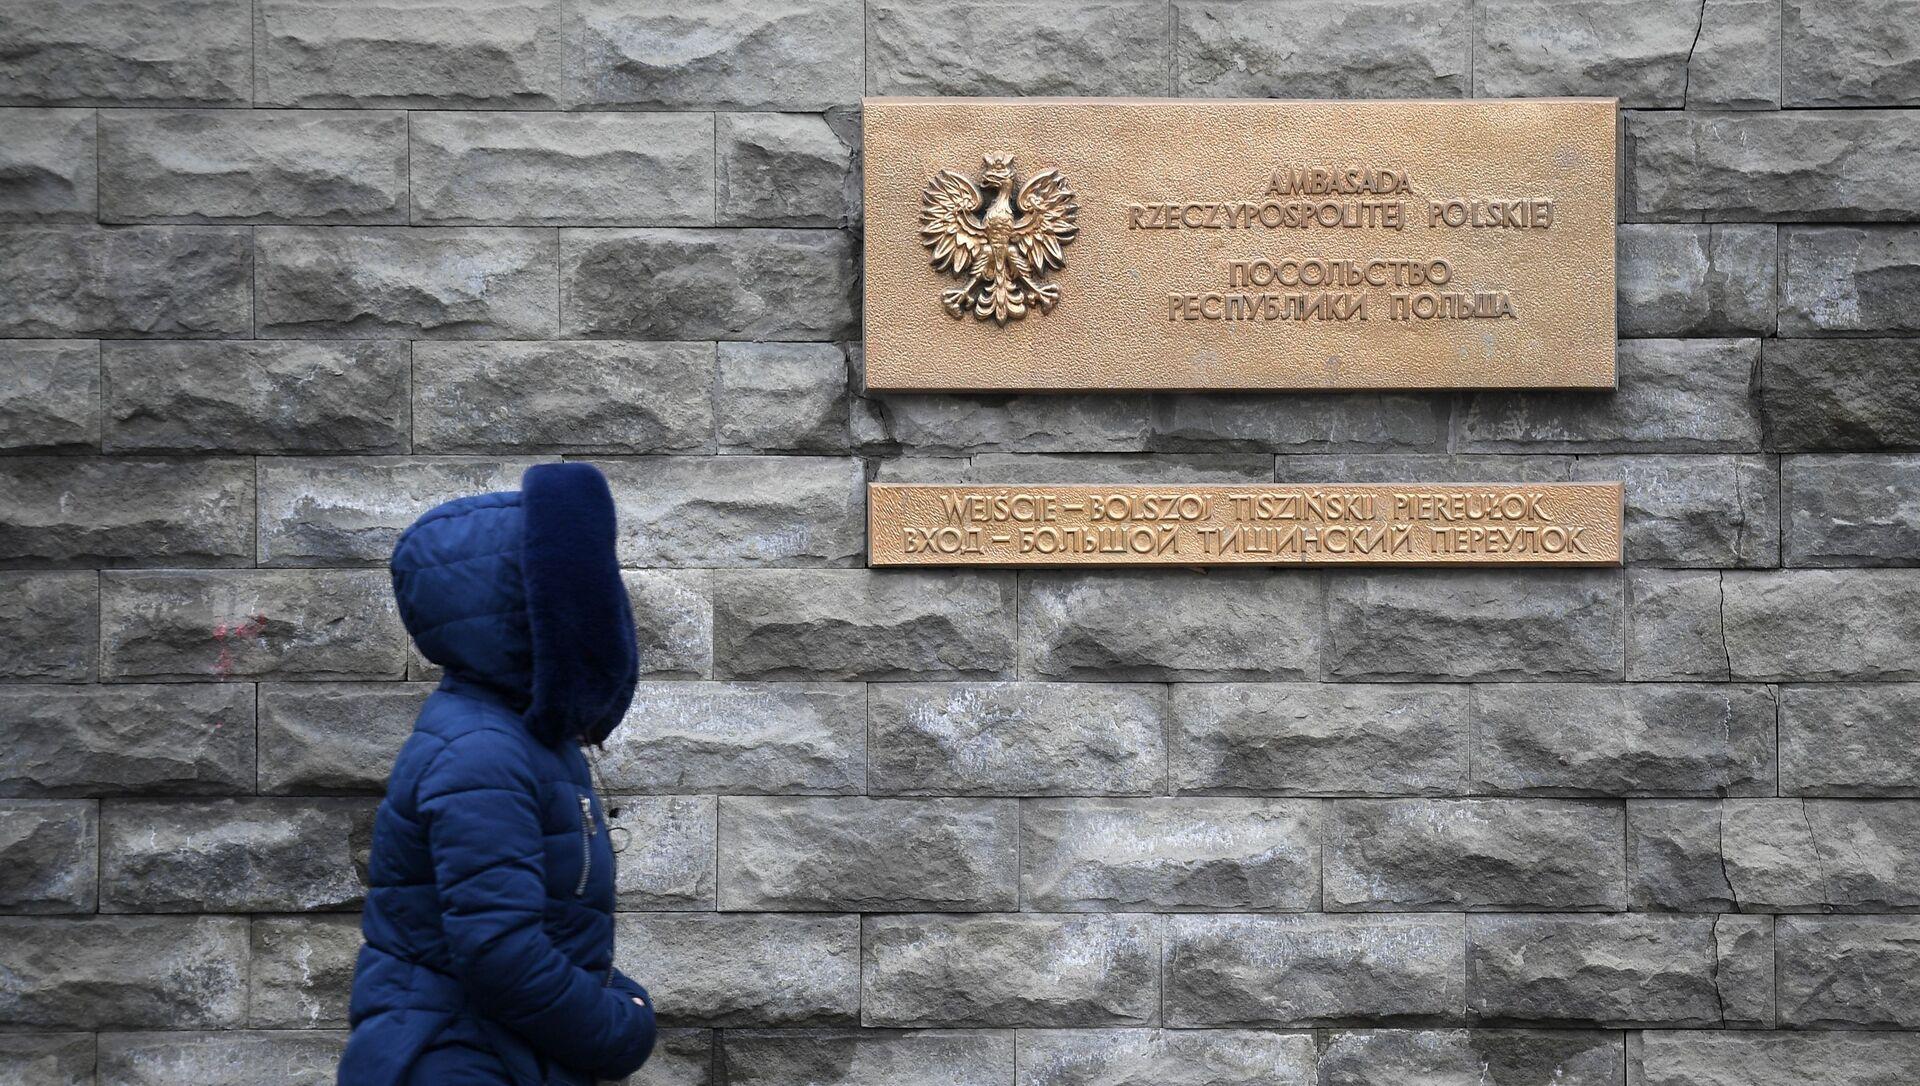 Ambasada Polski w Moskwie - Sputnik Polska, 1920, 16.03.2021